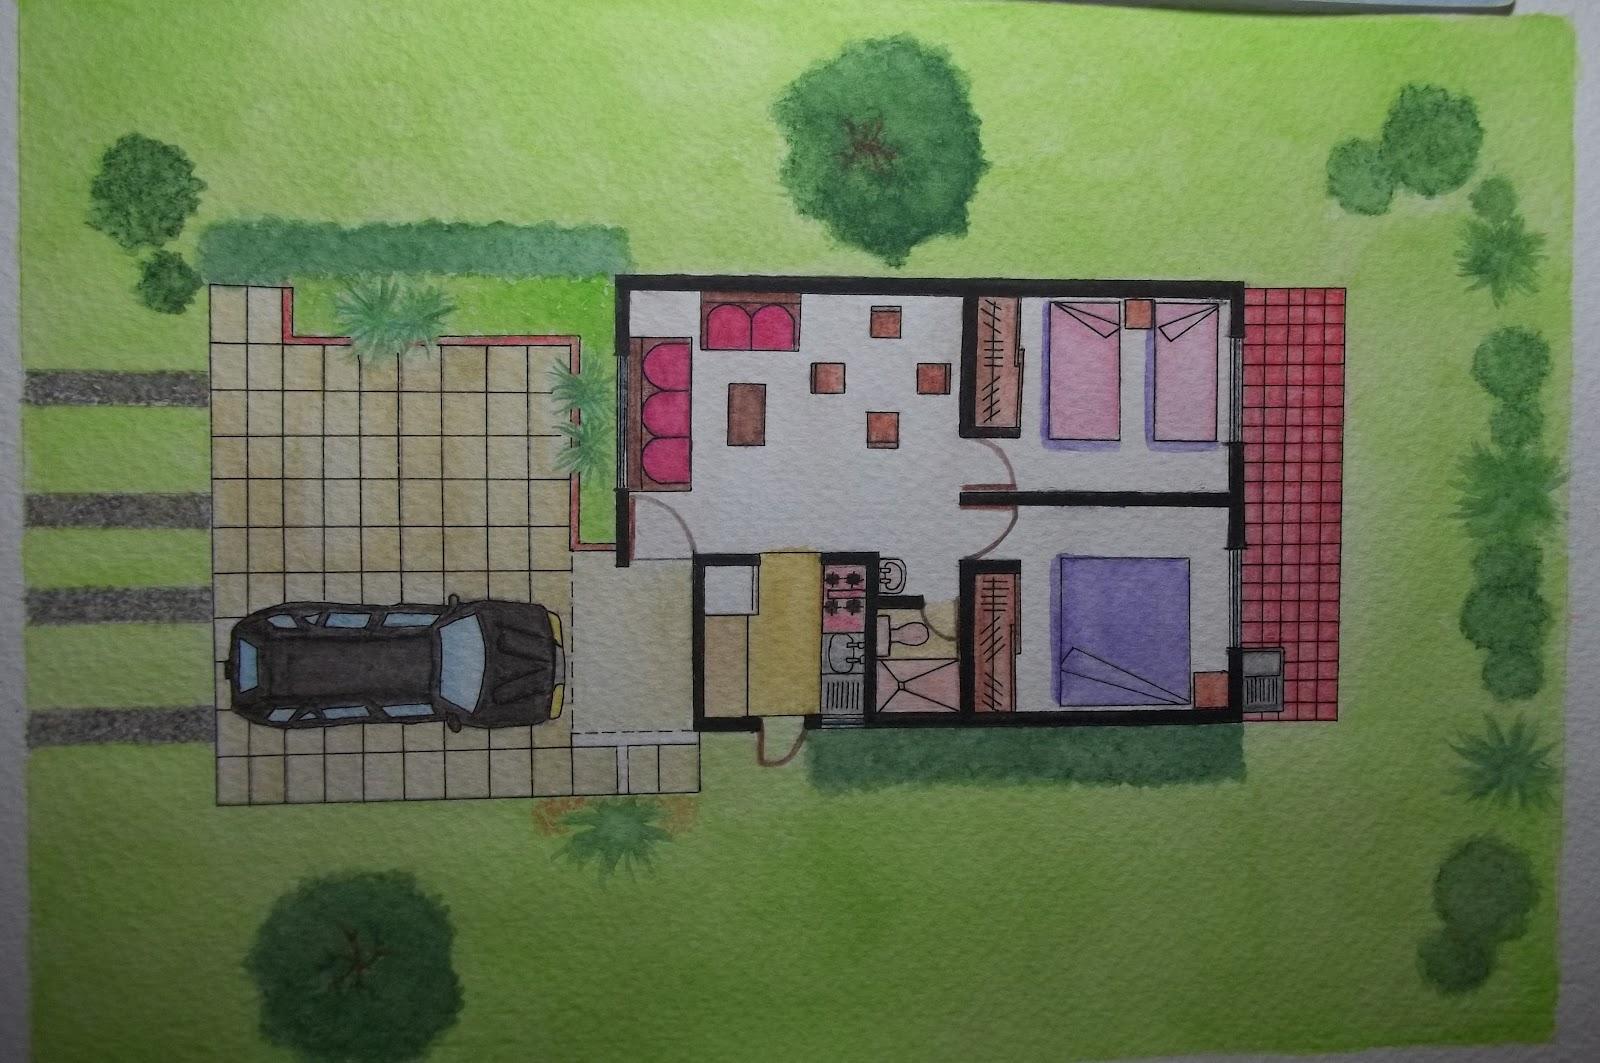 Arquitectura portafolio t cnicas de representaci n y for Tecnicas de representacion arquitectonica pdf